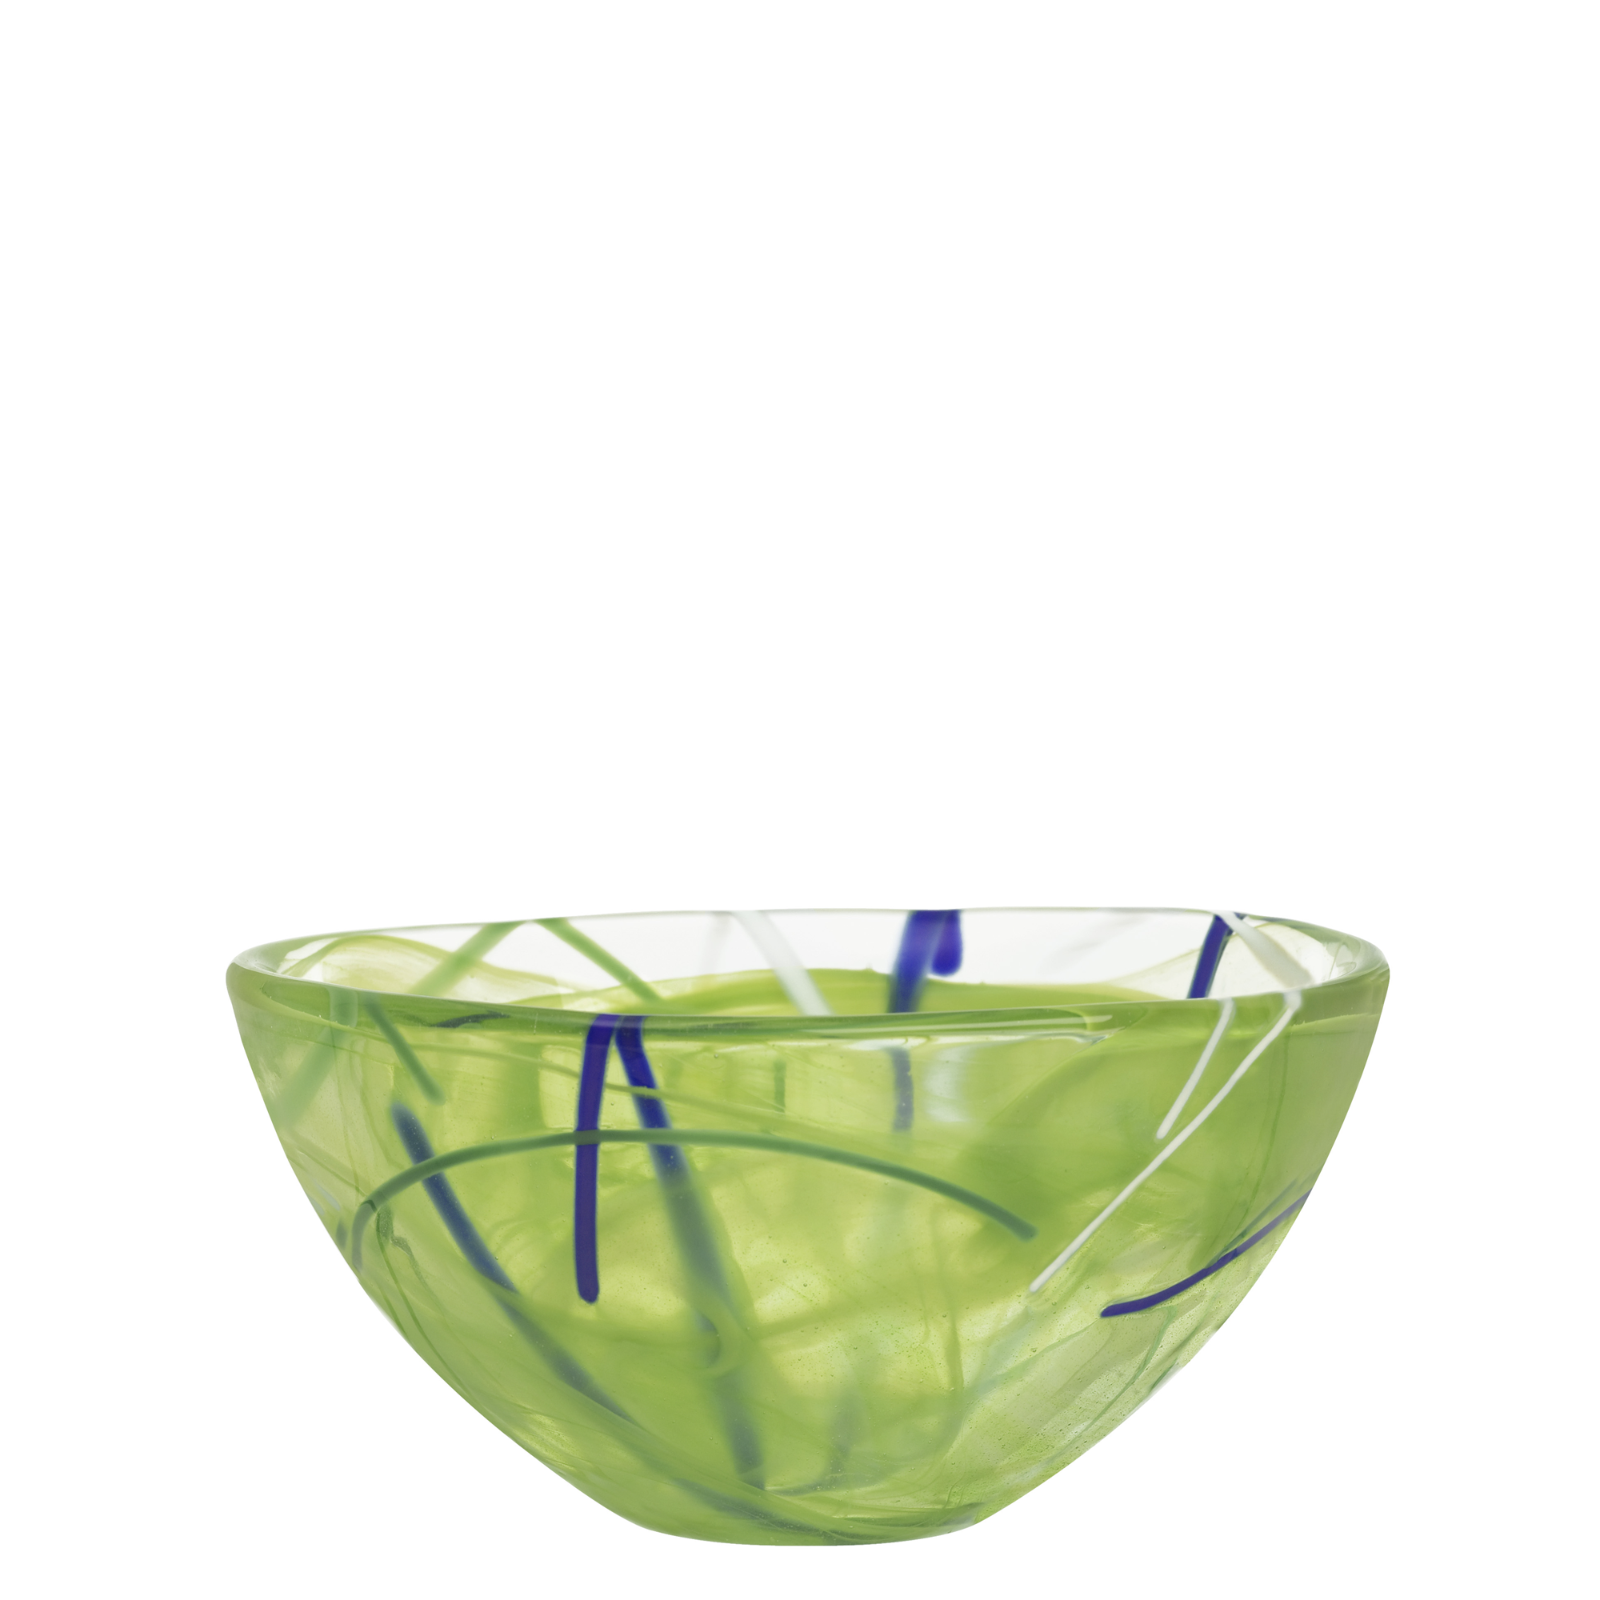 Kosta Boda Serveware Lime Contrast Bowl, 3 Sizes